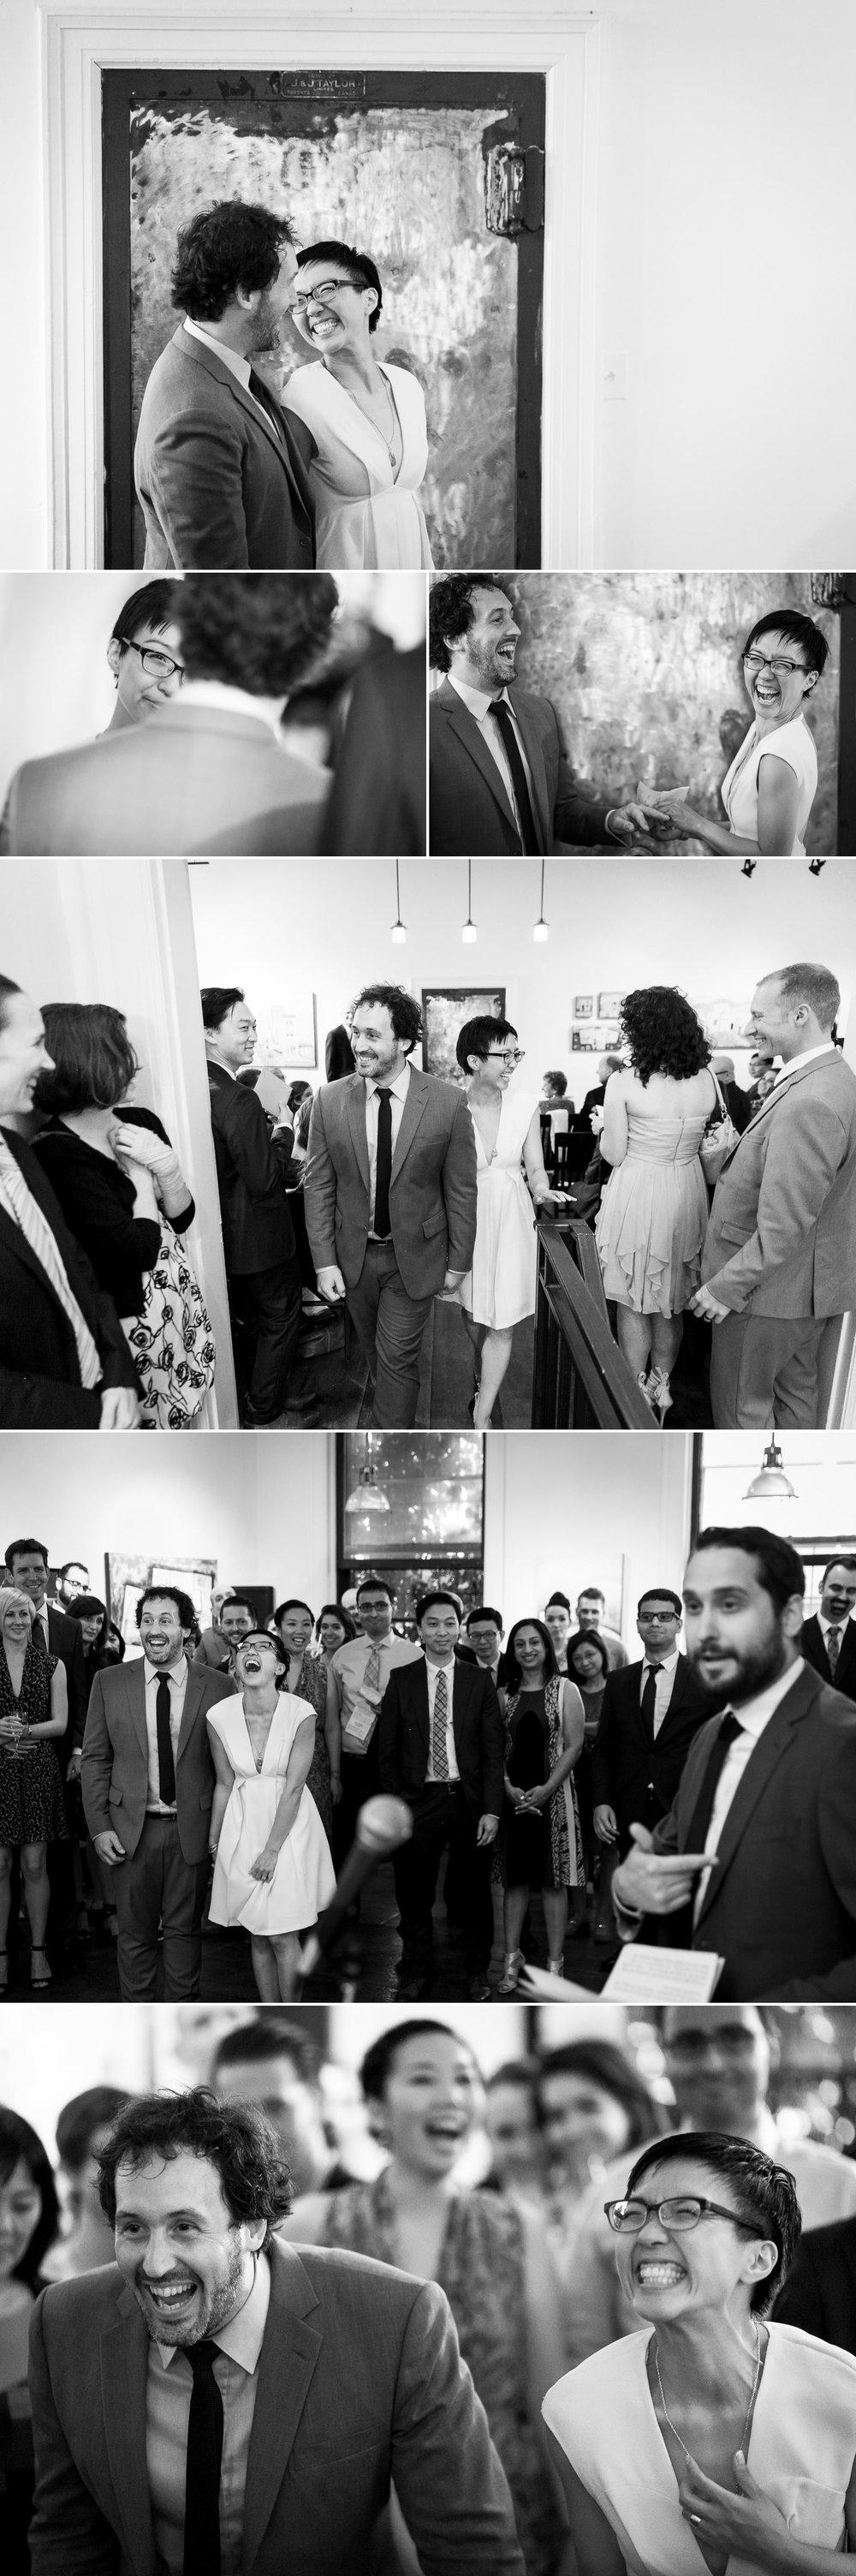 A wedding reception at the Orange Art Gallery in Ottawa